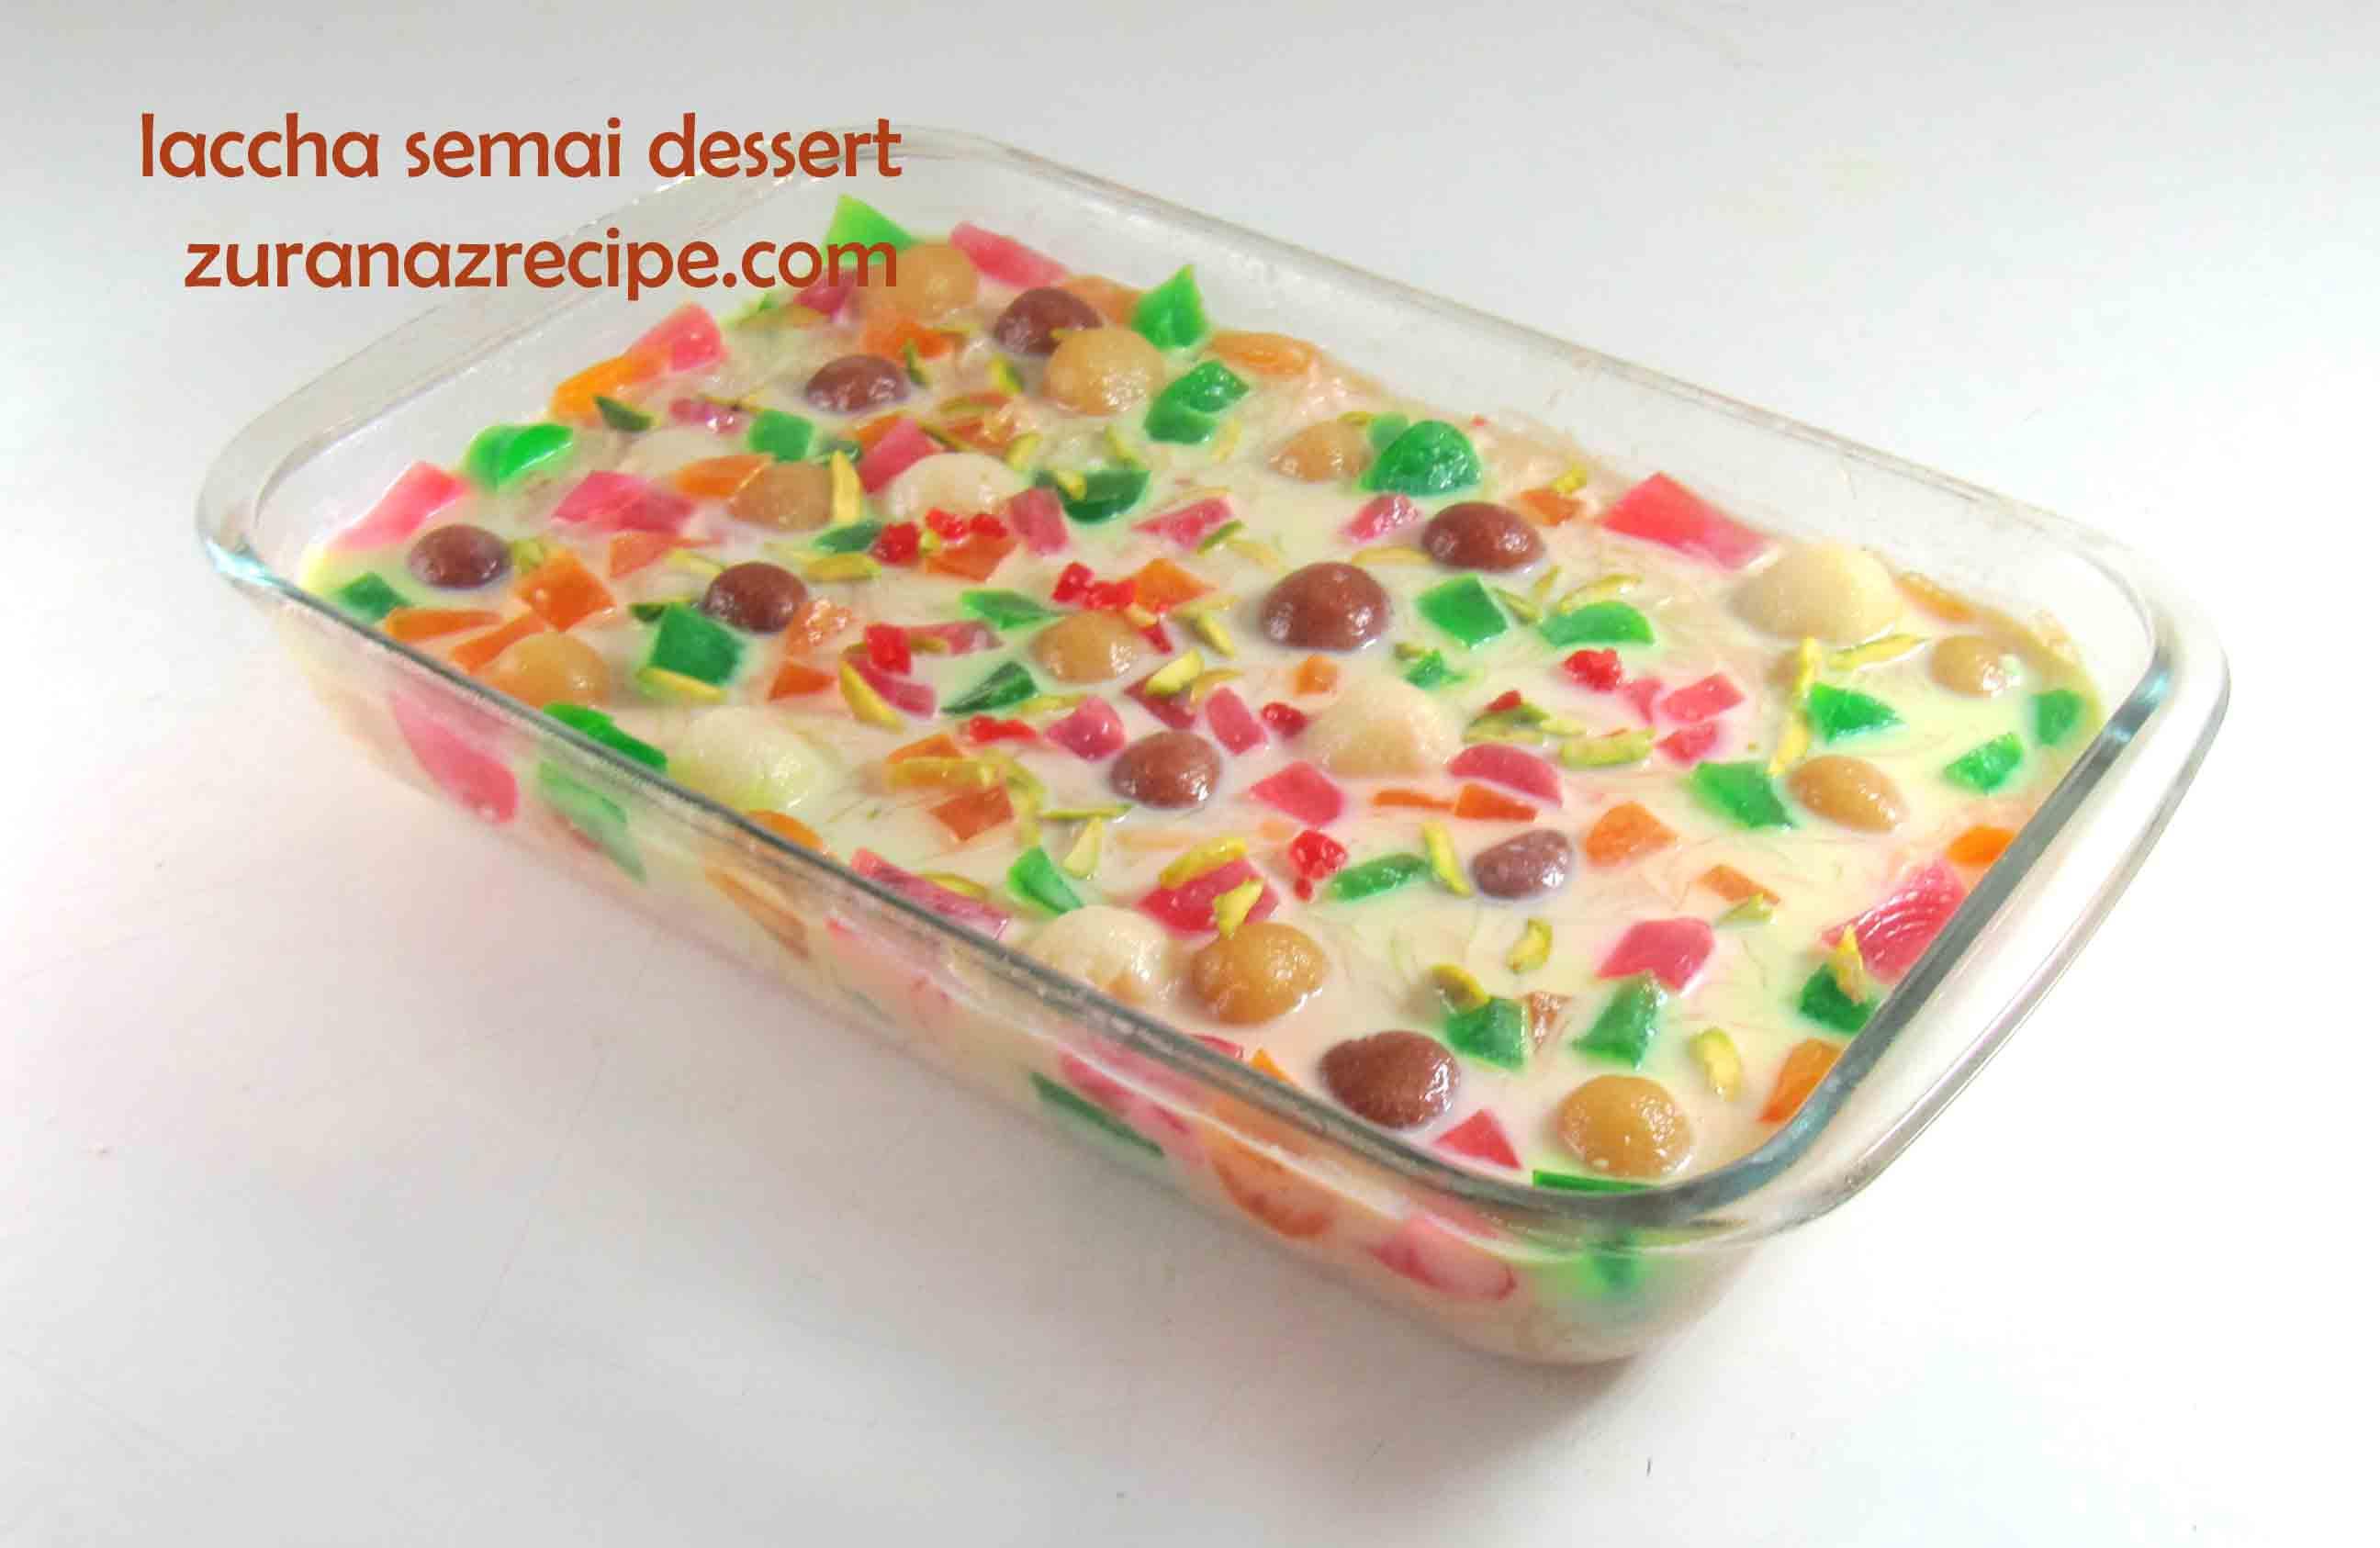 Lab-e-shireen /Dud dulari/Shemai Dessert